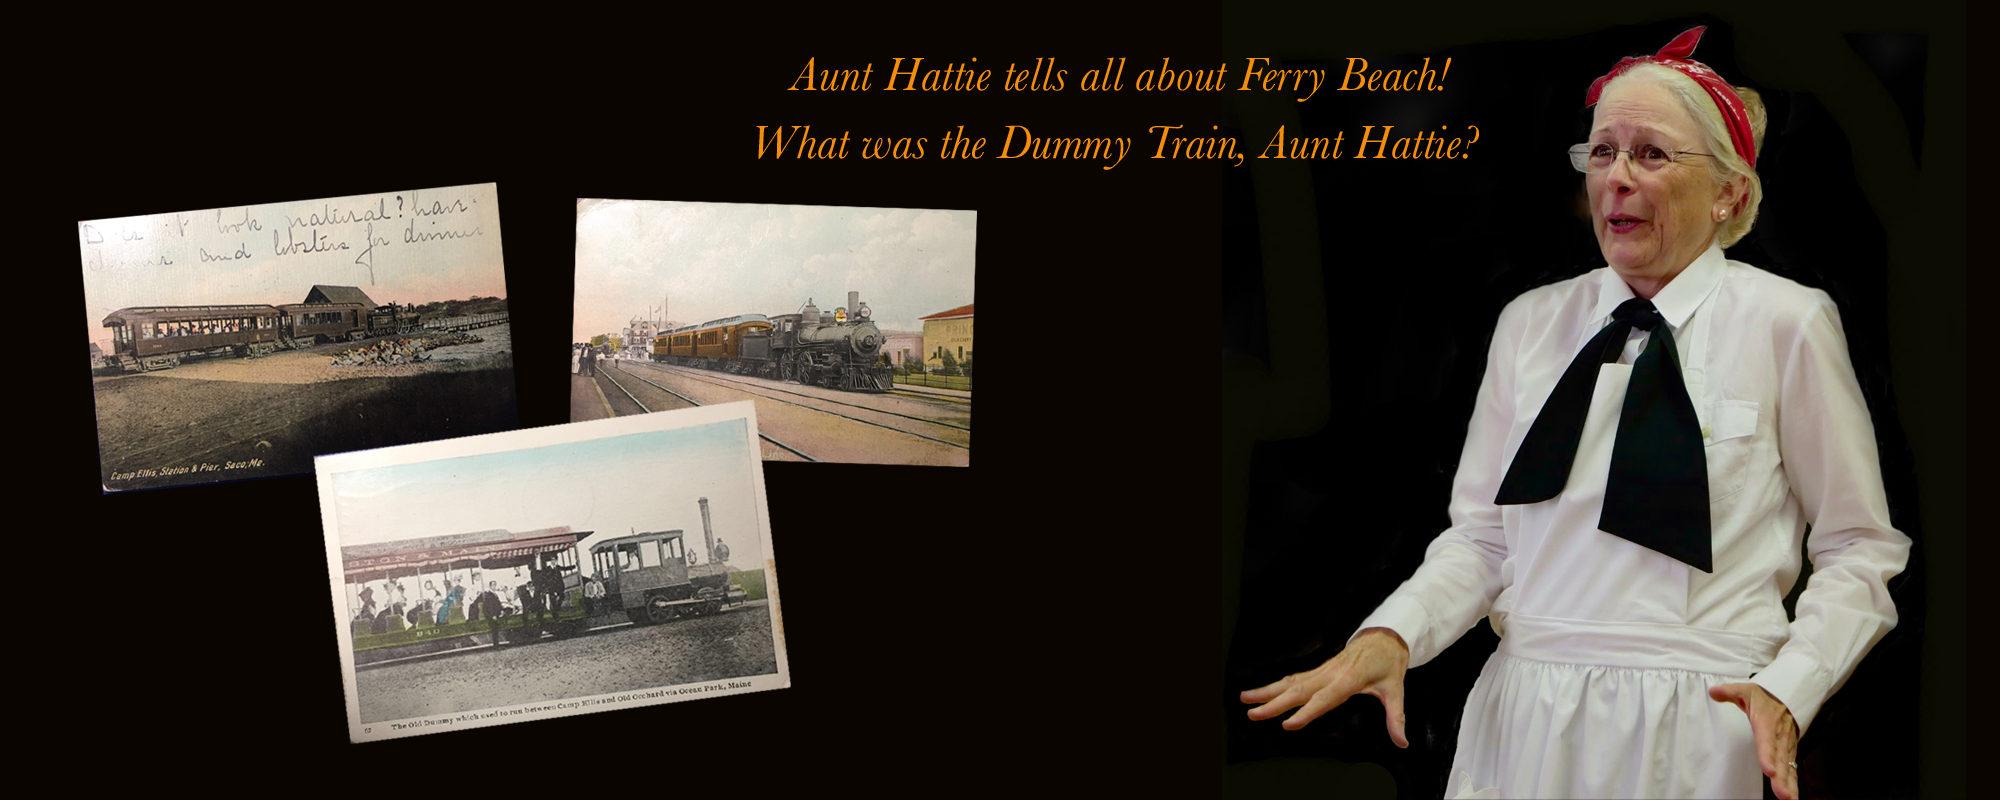 Jude Lamb, storyteller, as Aunt Hattie. Dummy Train postcard images.